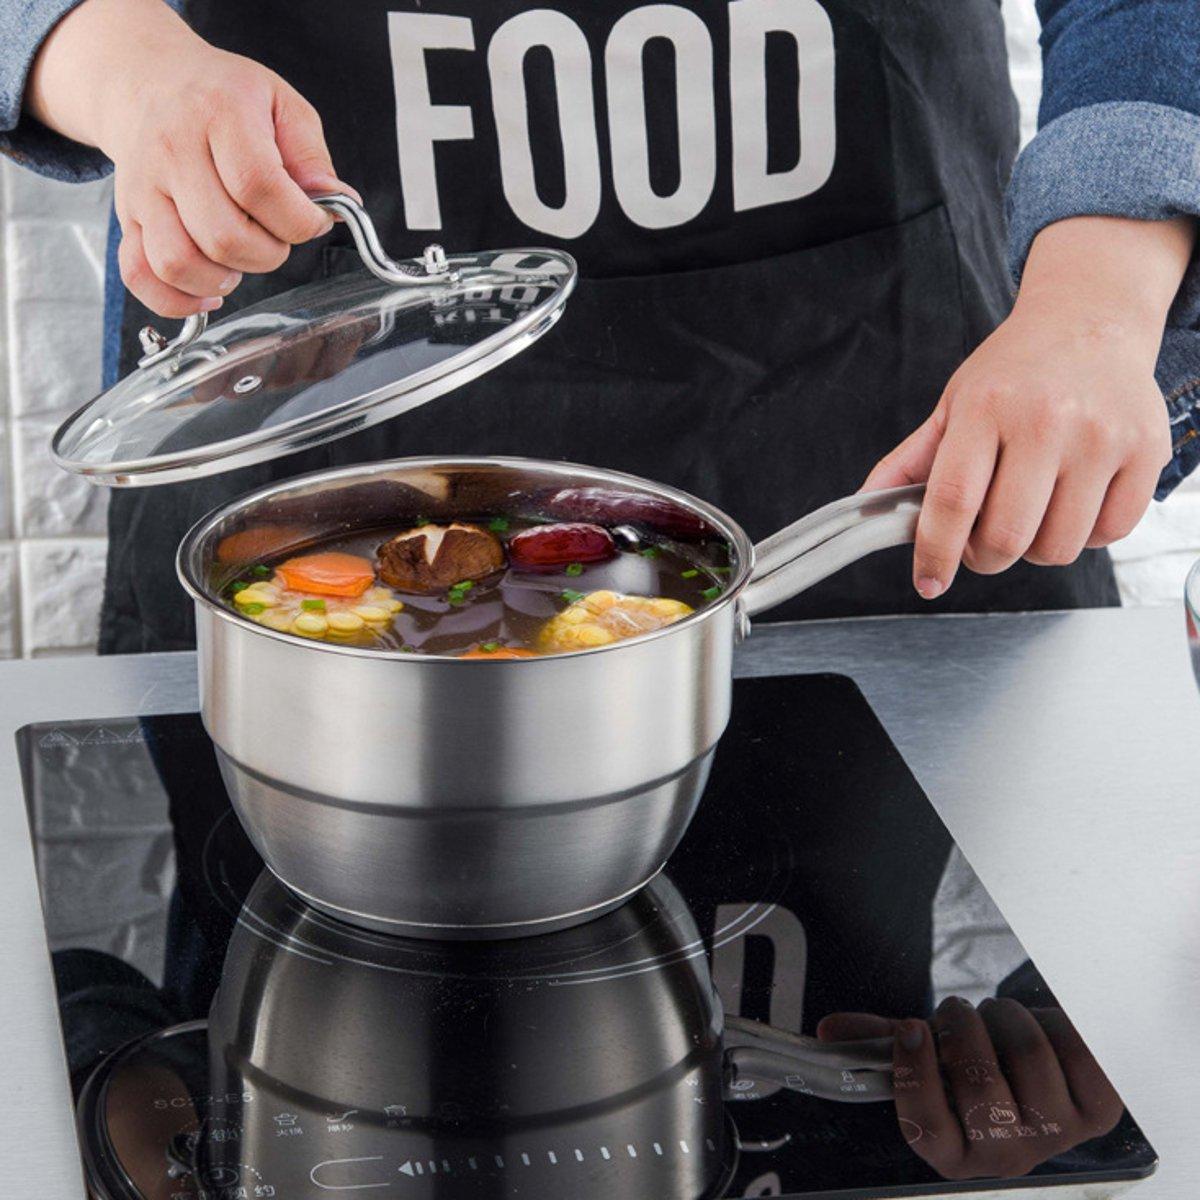 18cm Stainless Steel Steamer Induction Compatible Steamer Rack Milk Pot Cookware